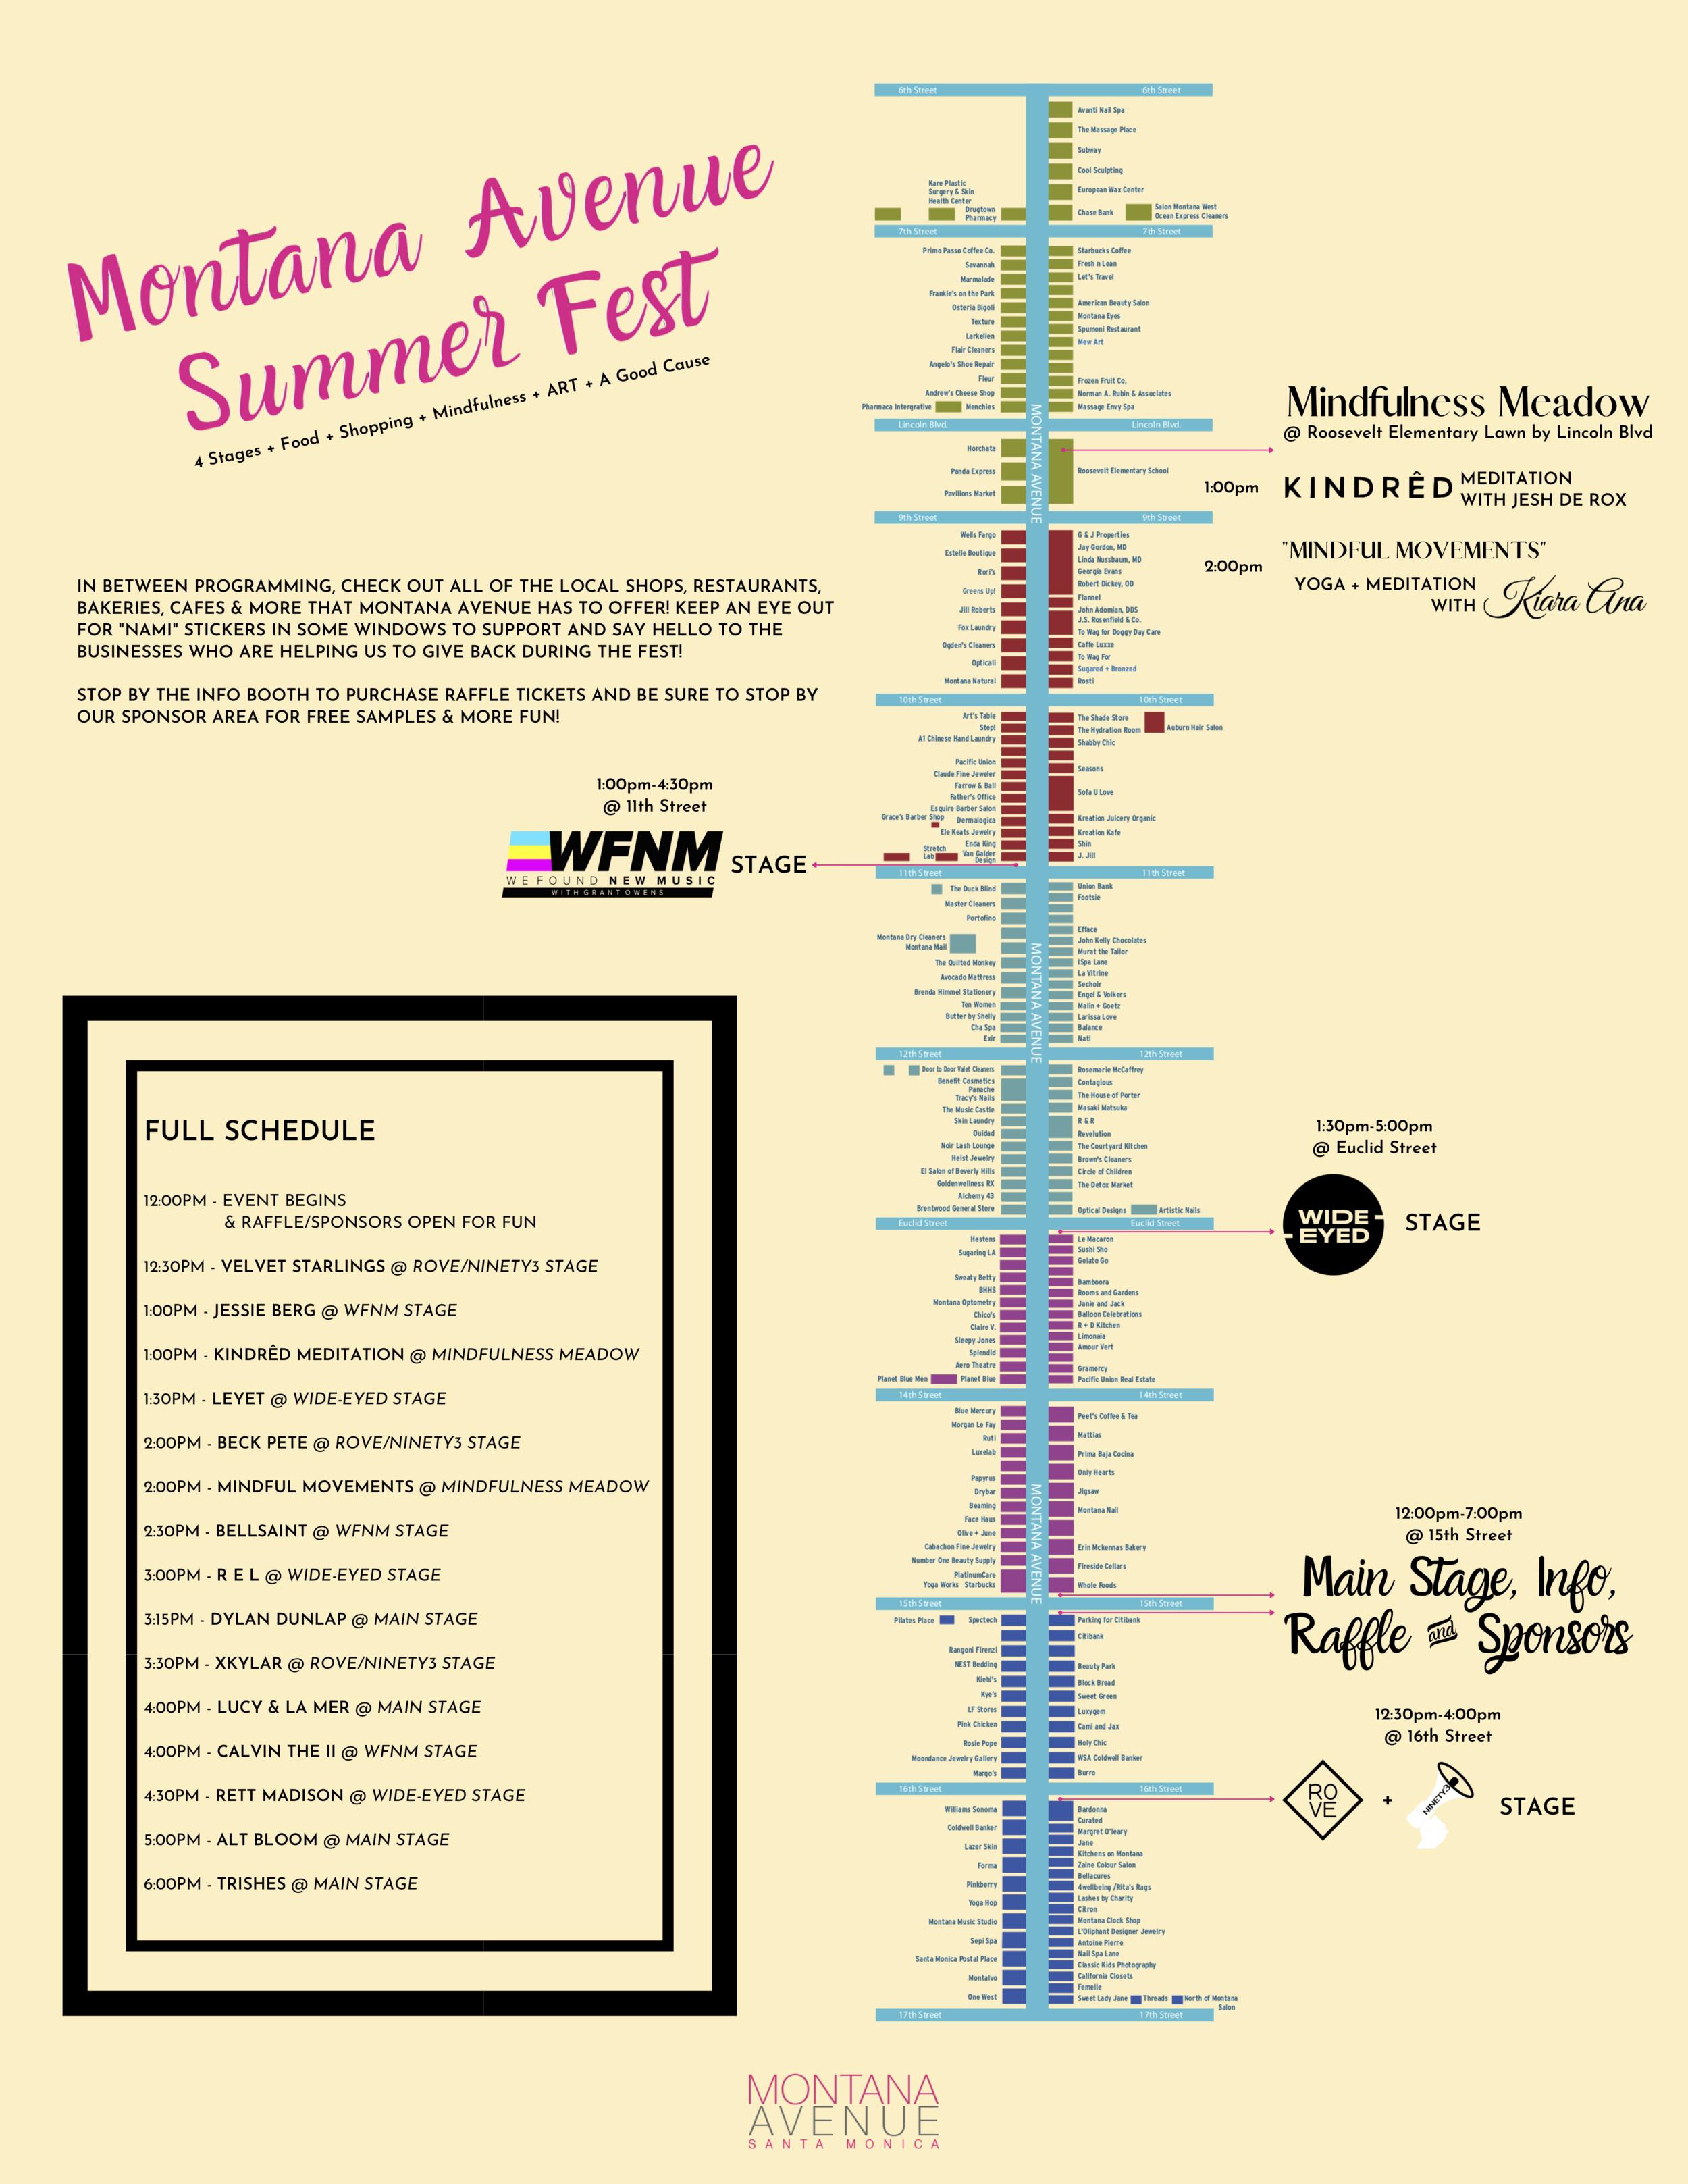 Montana Avenue Summer Fest MAP 8.56.30 PM.png